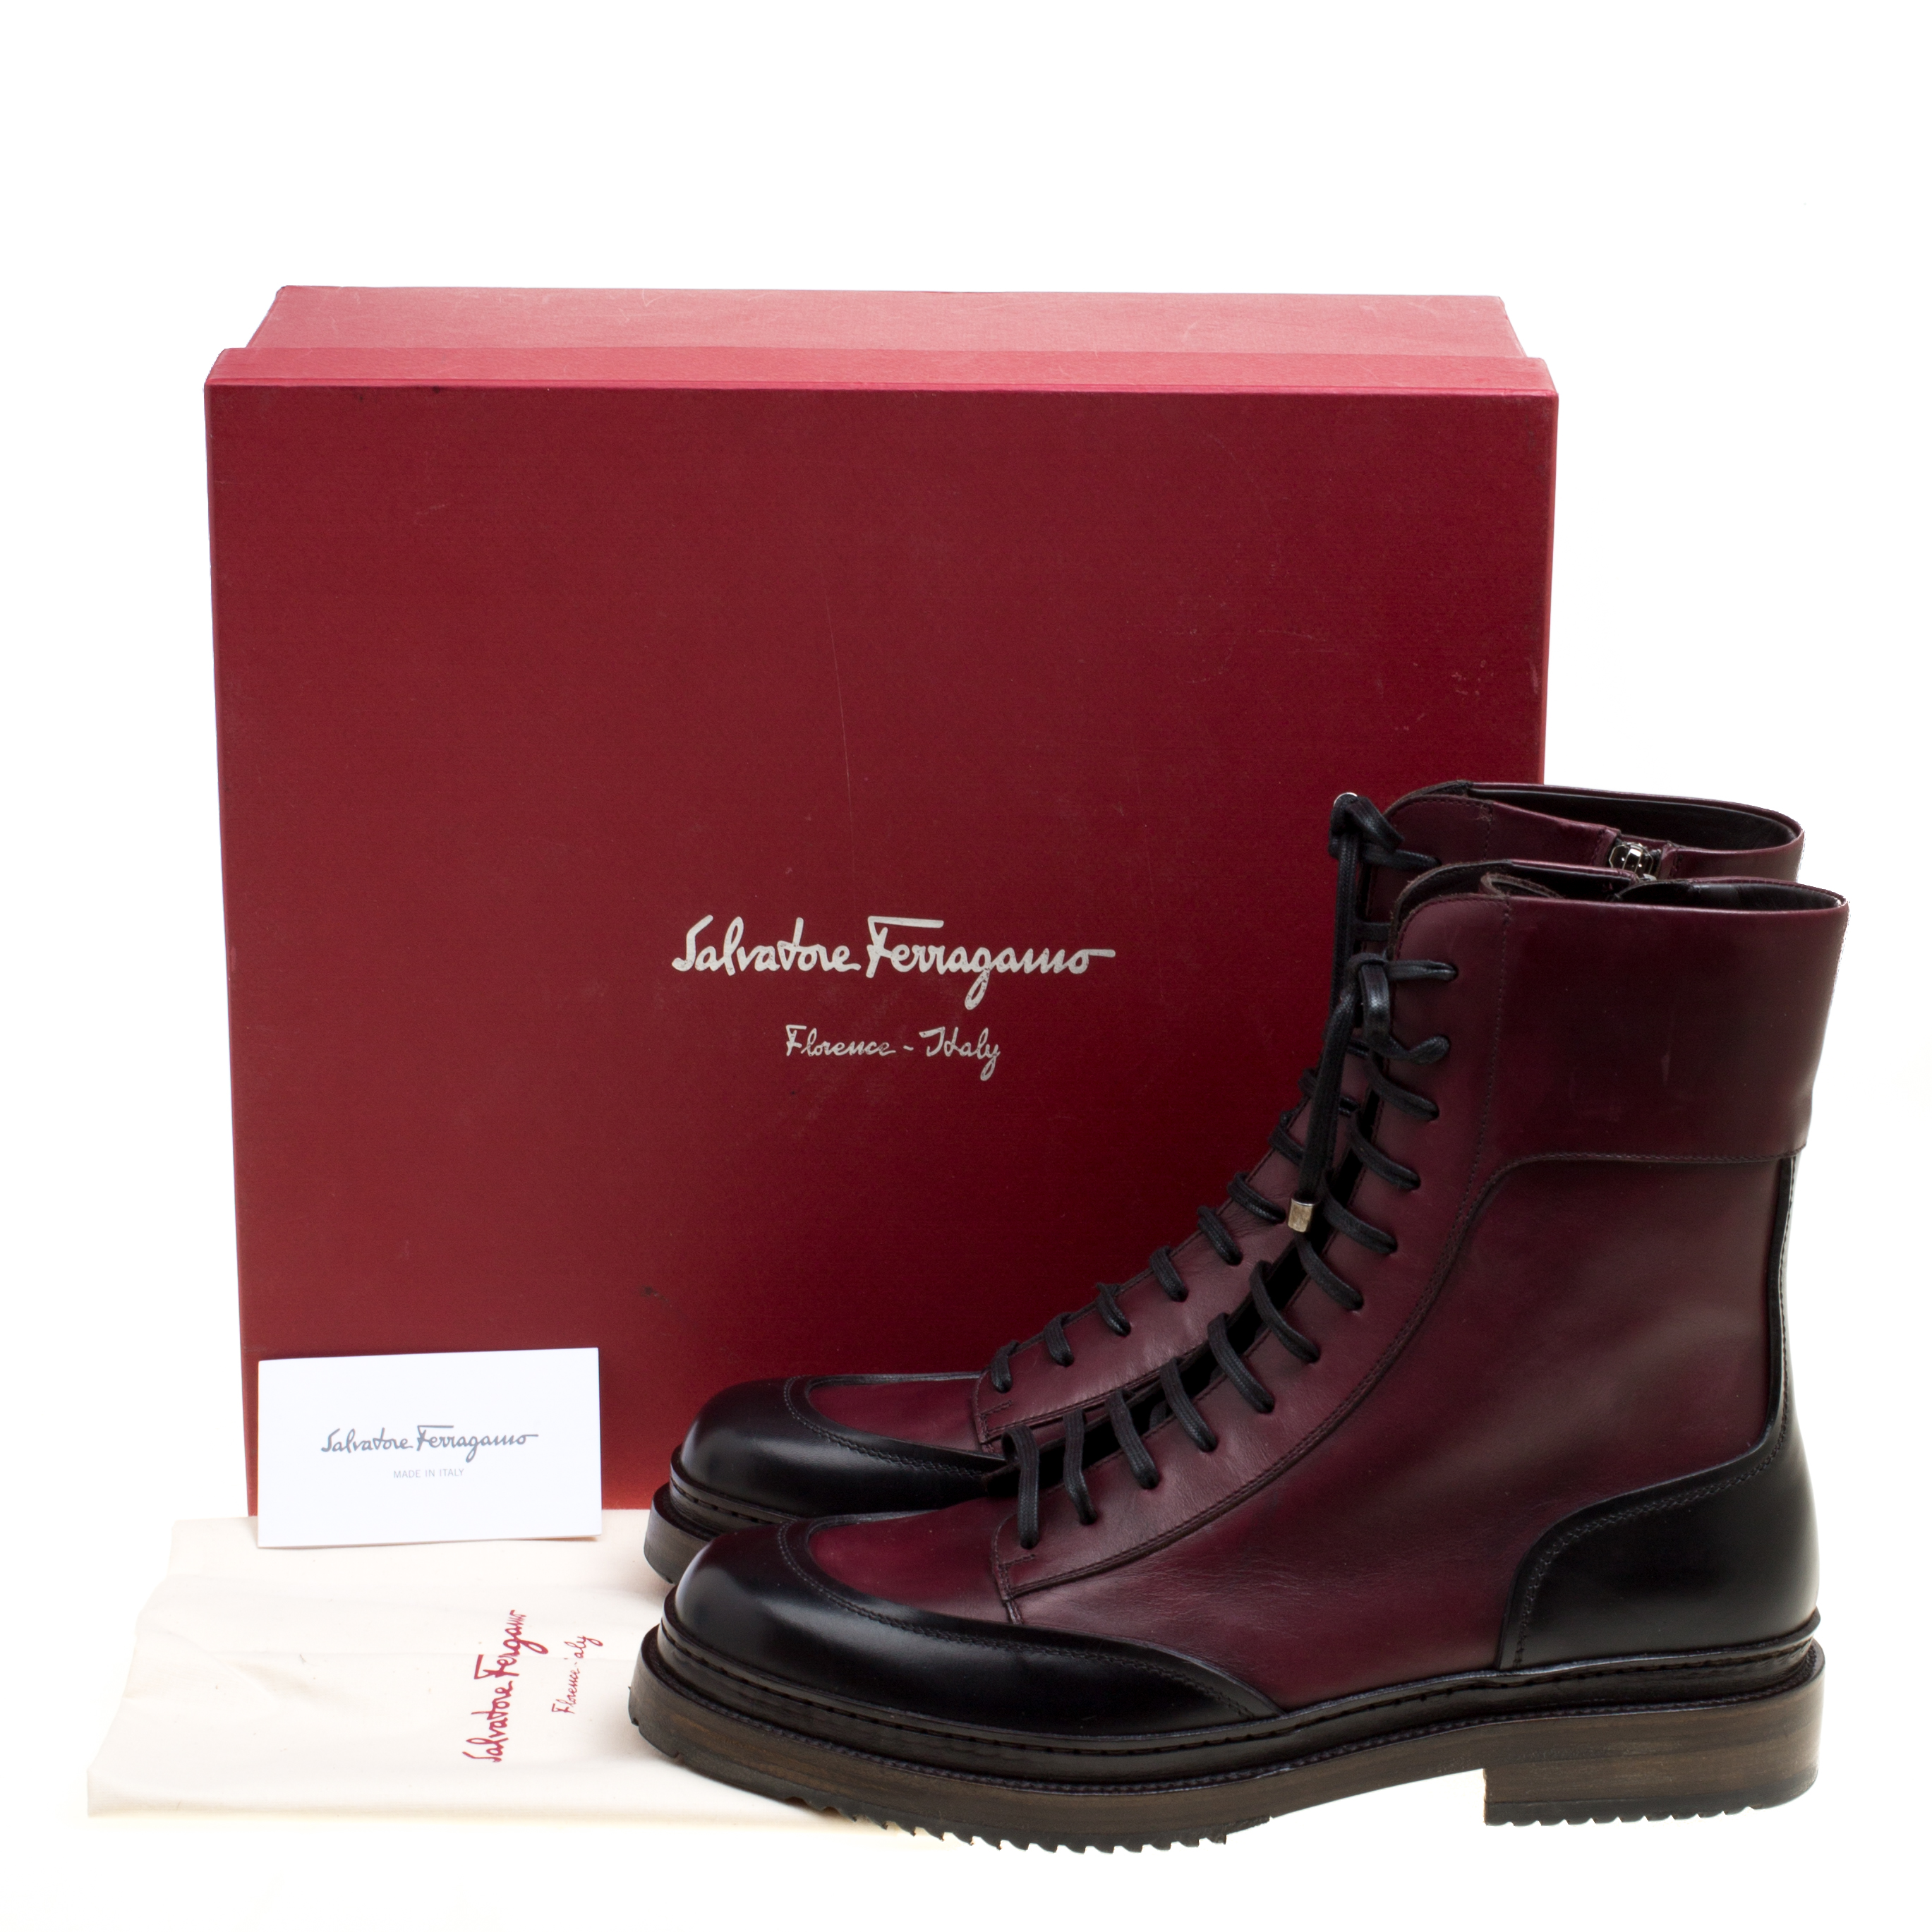 Salvatore Ferragamo Burgundy Leather